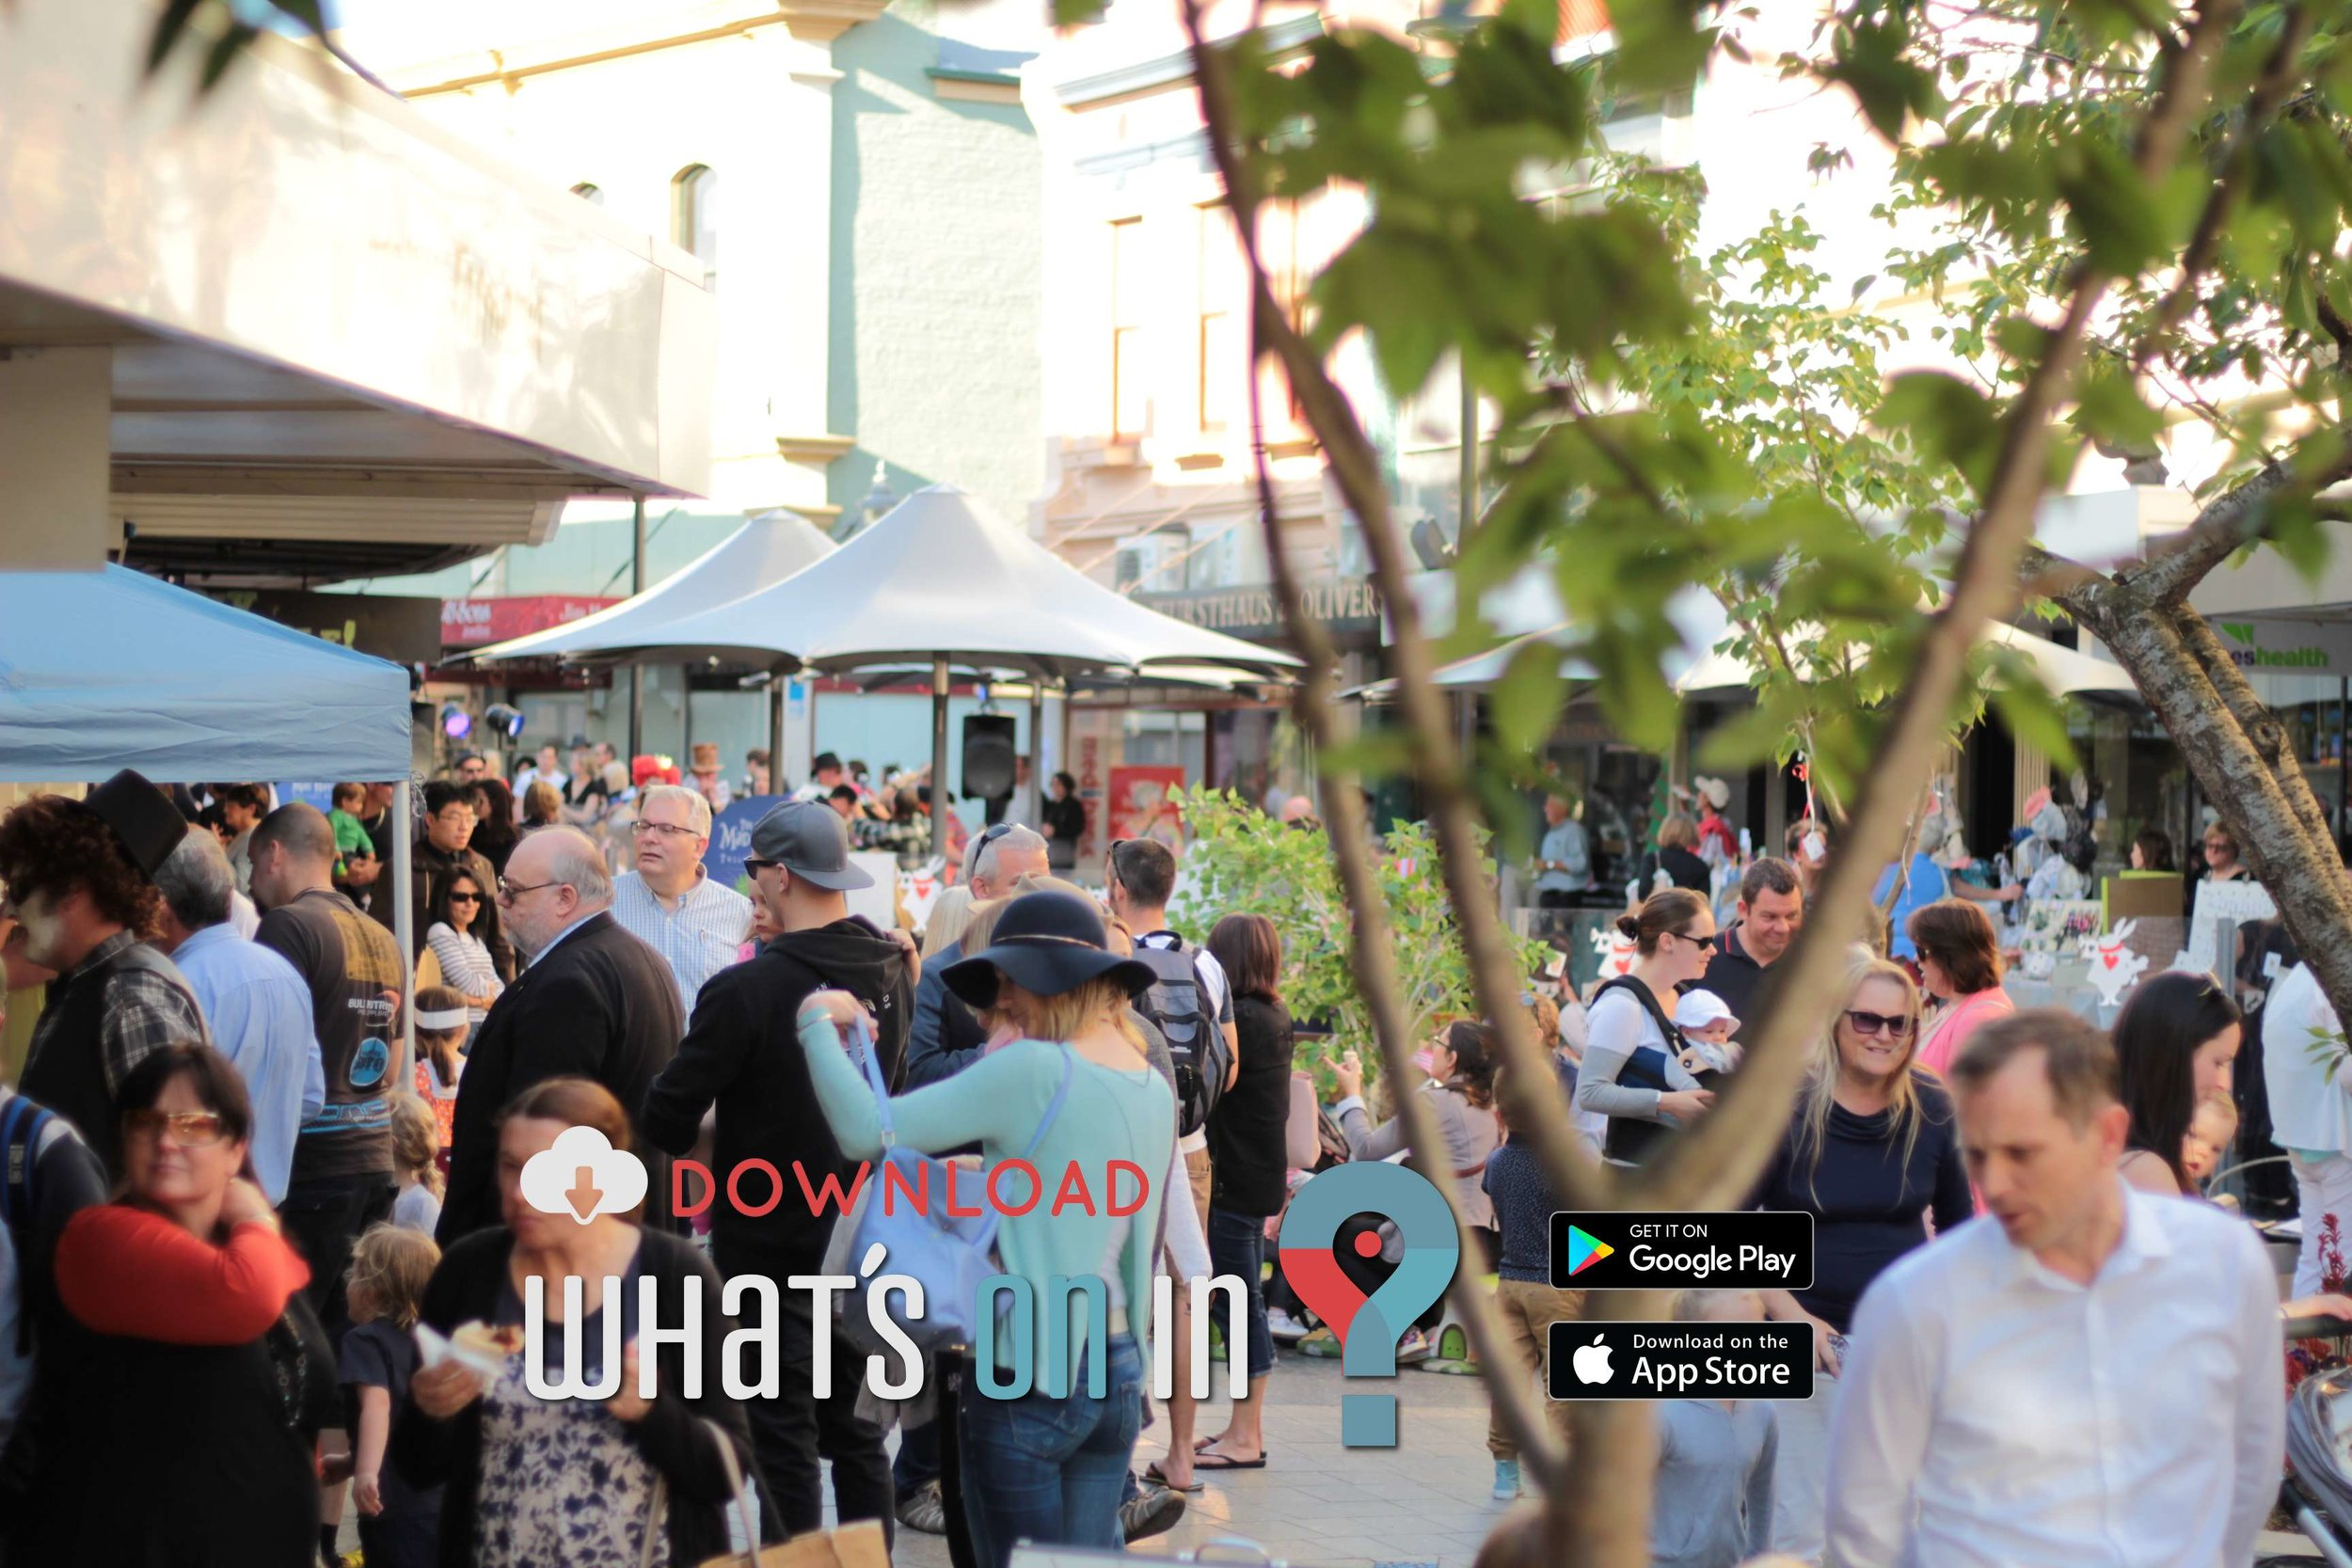 Mad Hatter's Twilight Markets, Launceston, Tasmania 2016 - What's On In App 029 IMG_8470.jpg